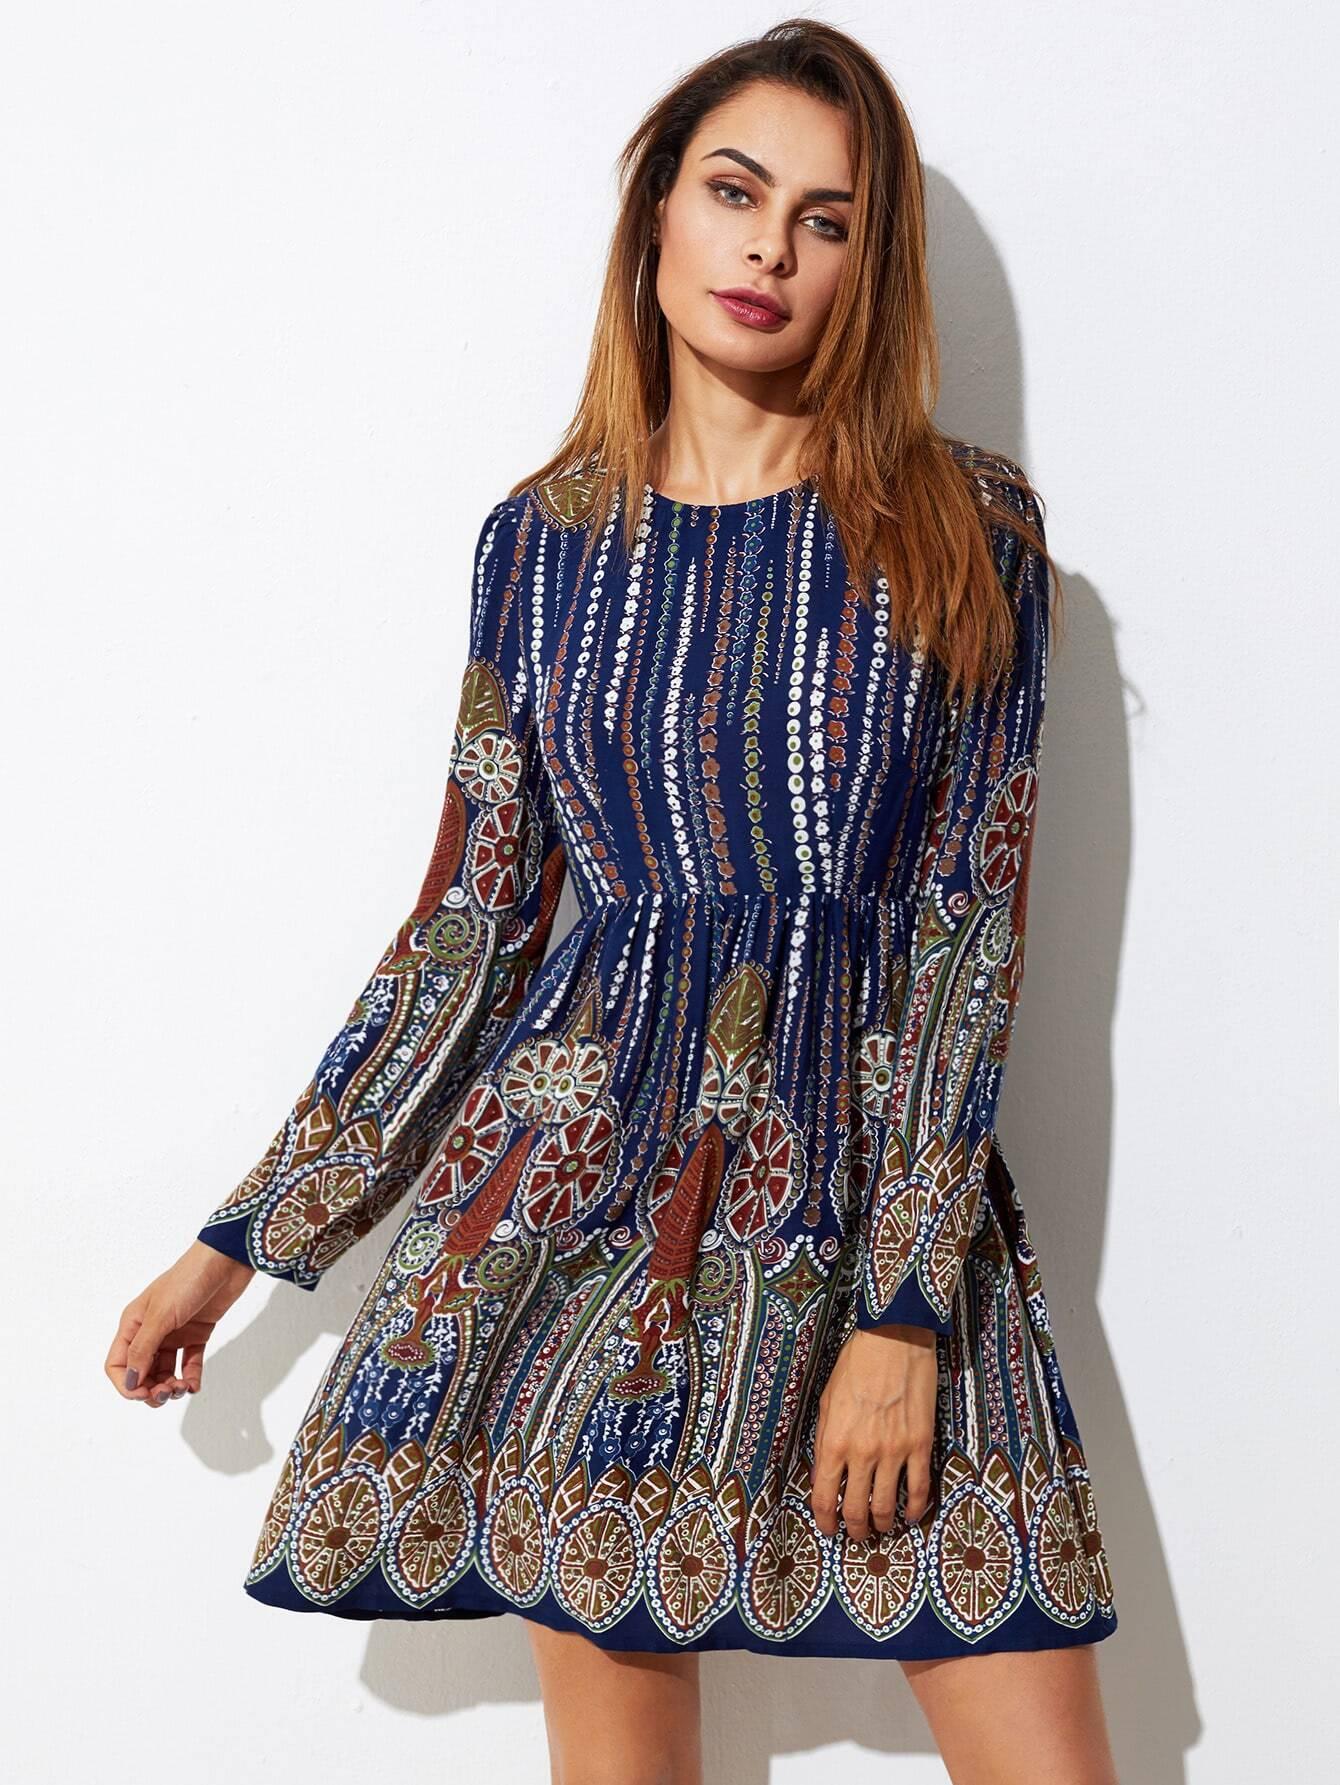 Ornate Print Smock Dress corduroy babydoll smock dress